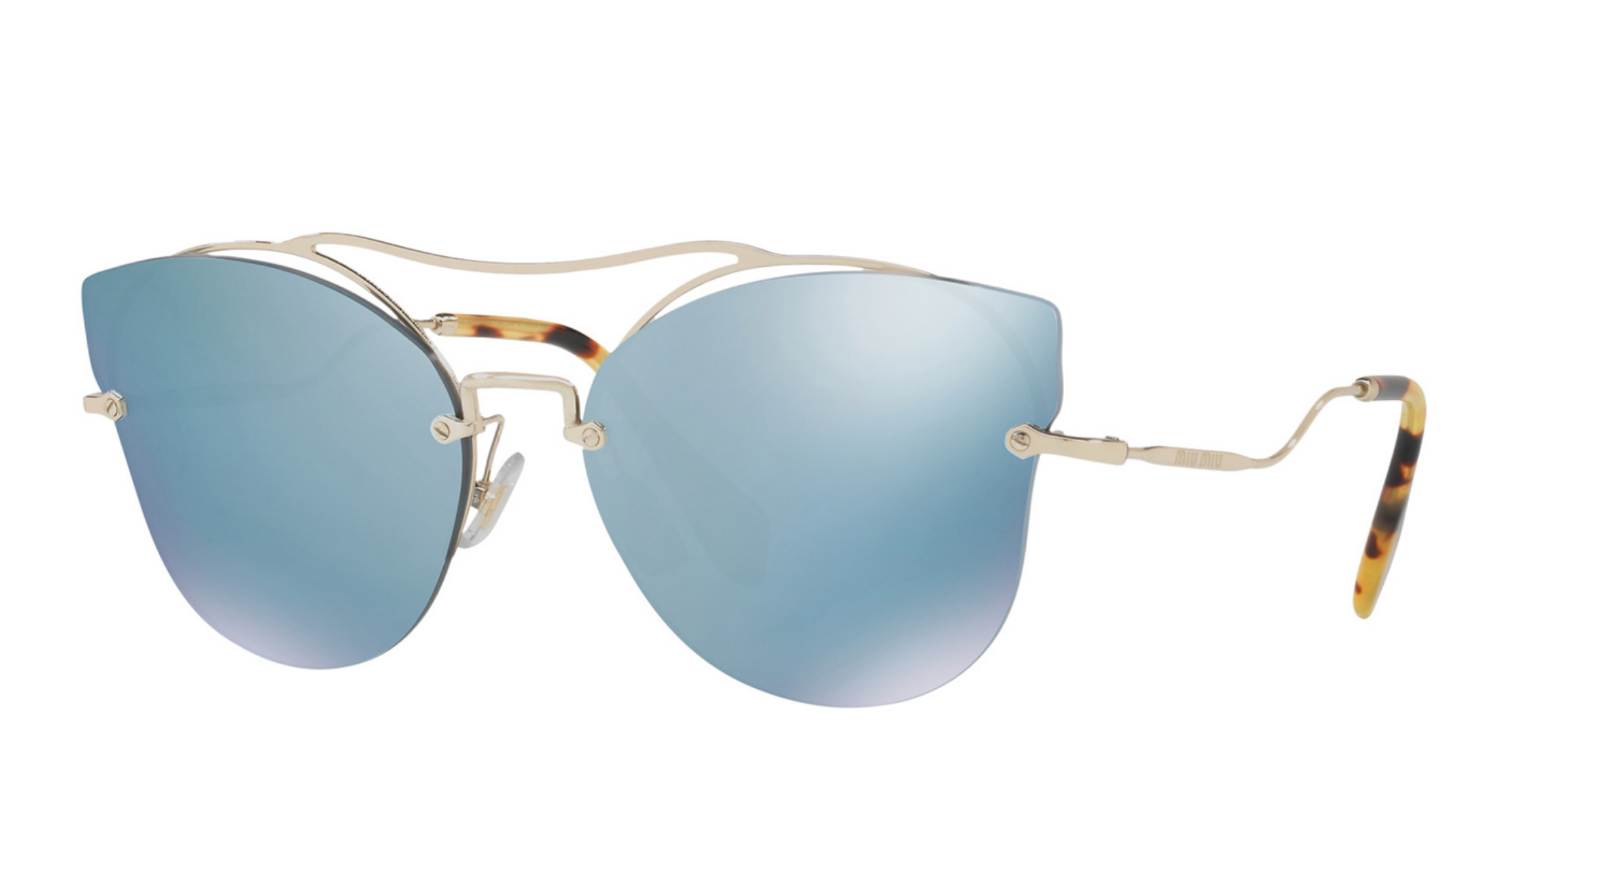 dba1ee89fe15a 57. 57. Previous. Miu Miu SMU 52S ZVN-5Q0 Sunglasses Pale Gold Frame Blue  Mirror White Lenses 62mm